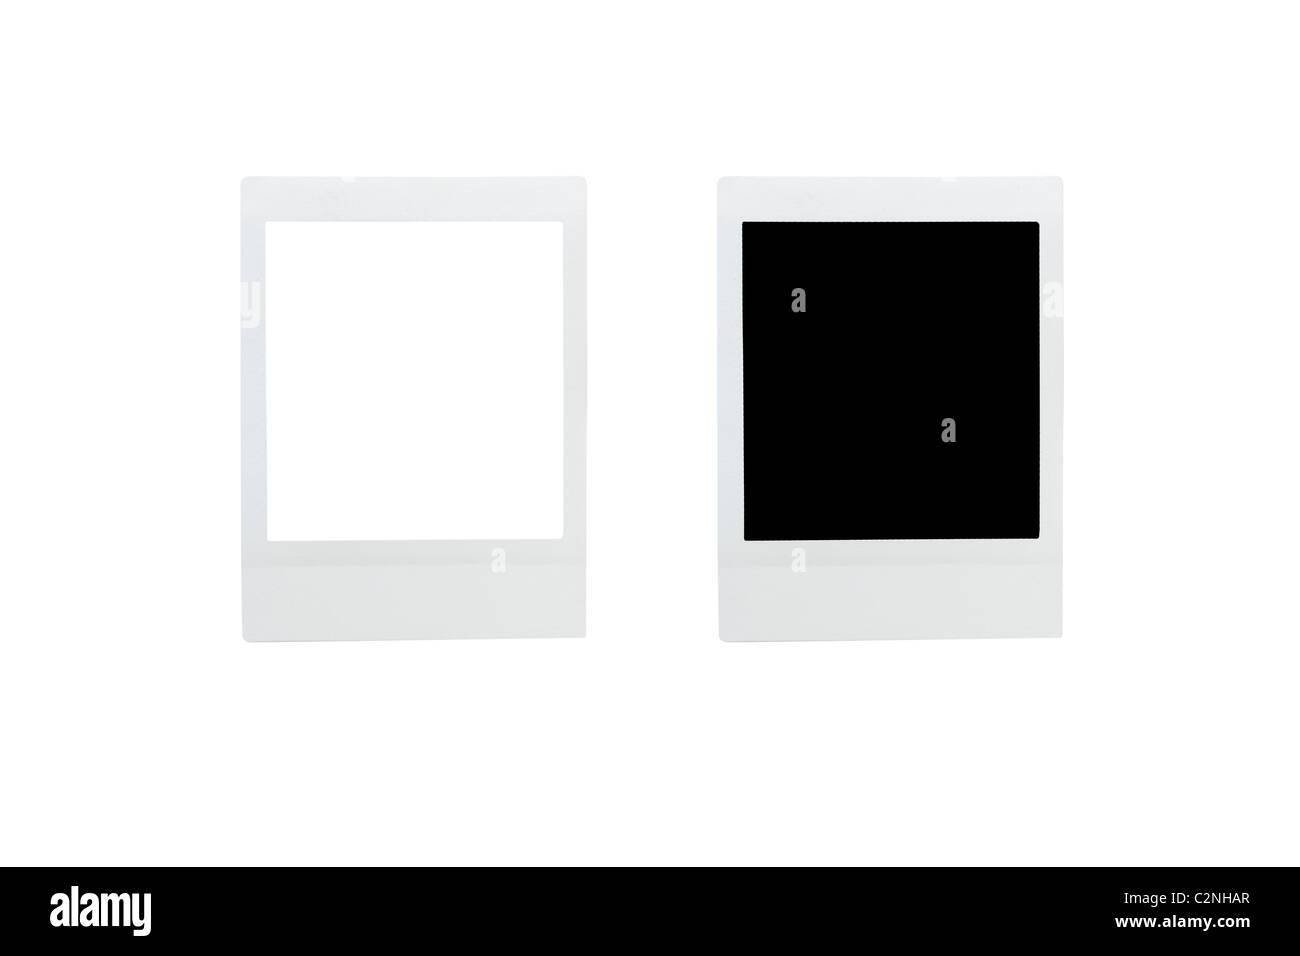 Nett Polaroid Vorlage Photoshop Fotos - Entry Level Resume Vorlagen ...